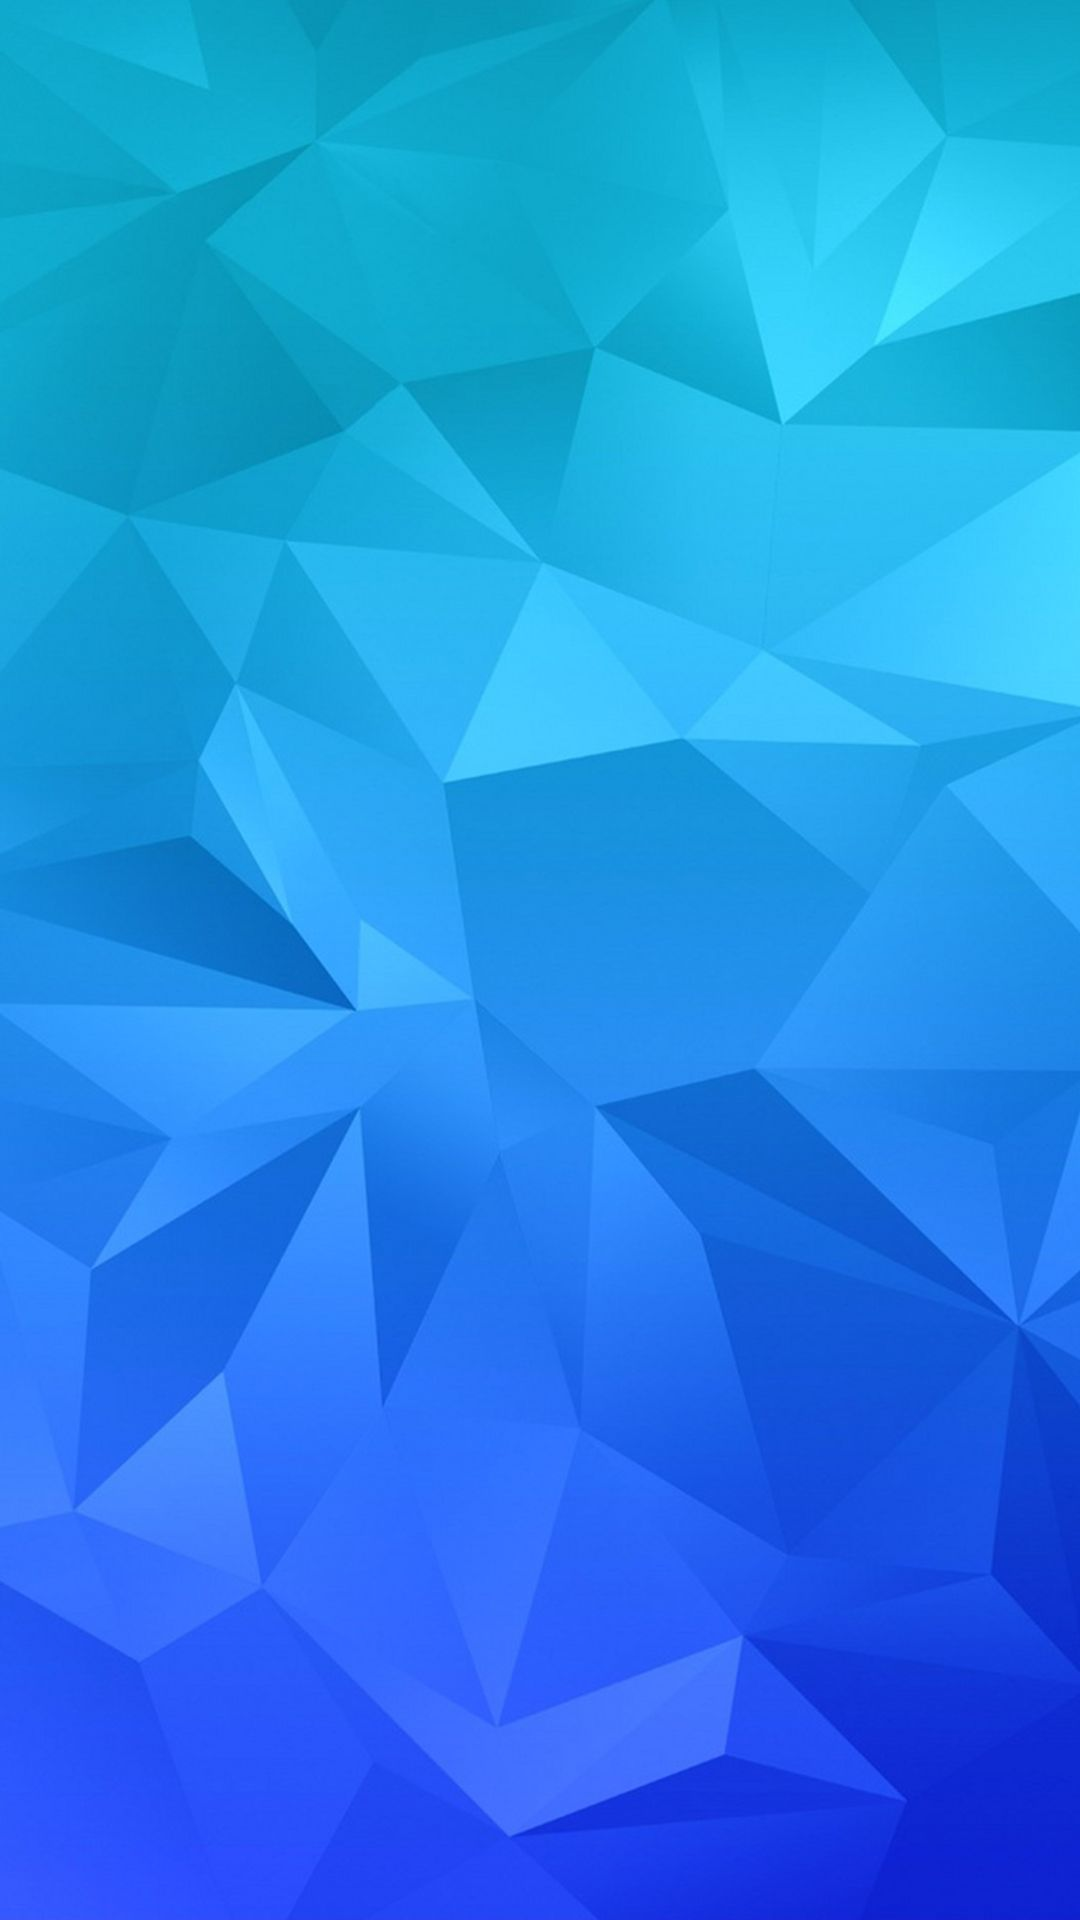 Padrão Azulejo Design Gráfico Background In 2019 Artwork